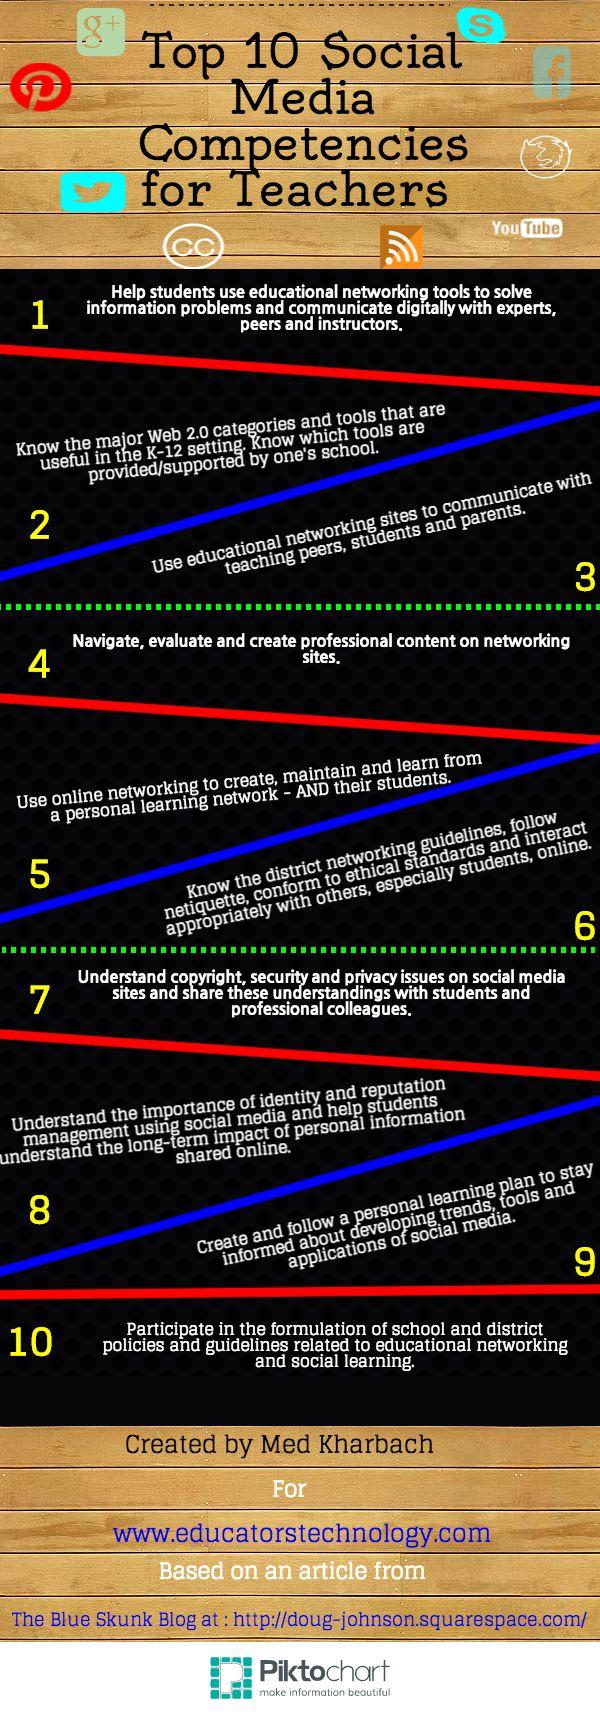 Top ten social media competencies for teachers